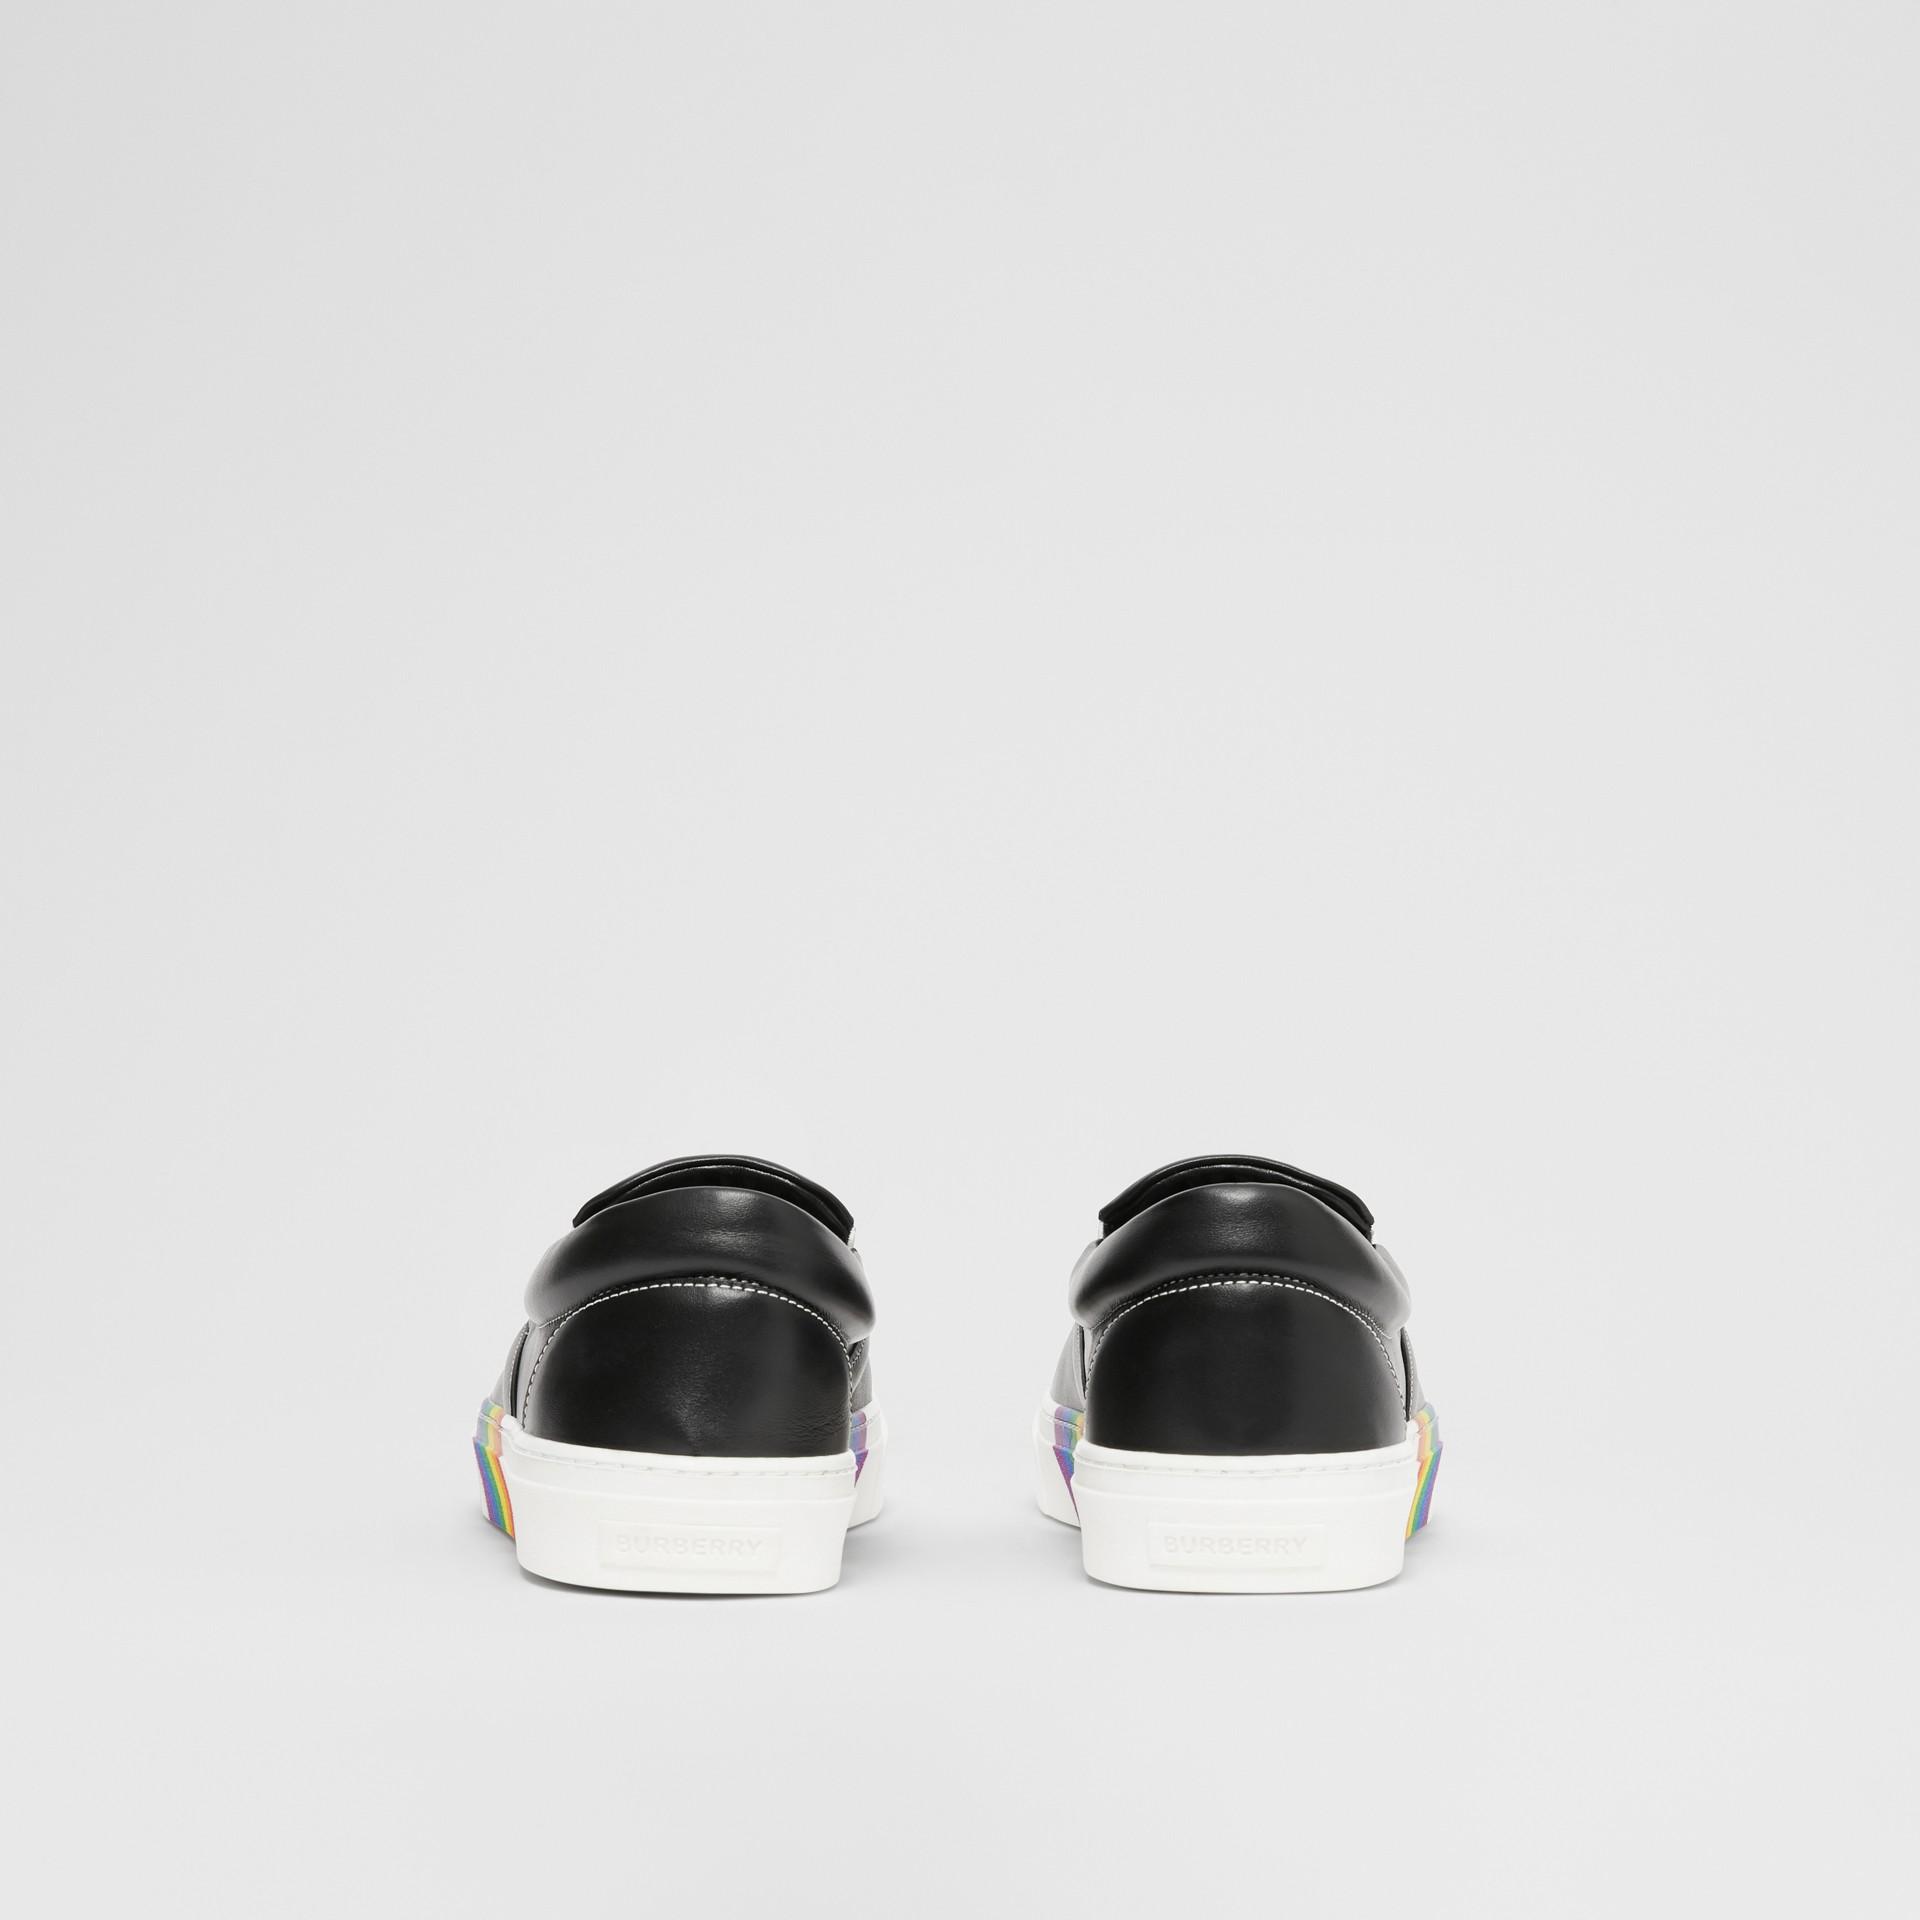 Rainbow Print Leather Slip-on Sneakers in Black - Women   Burberry United Kingdom - gallery image 4